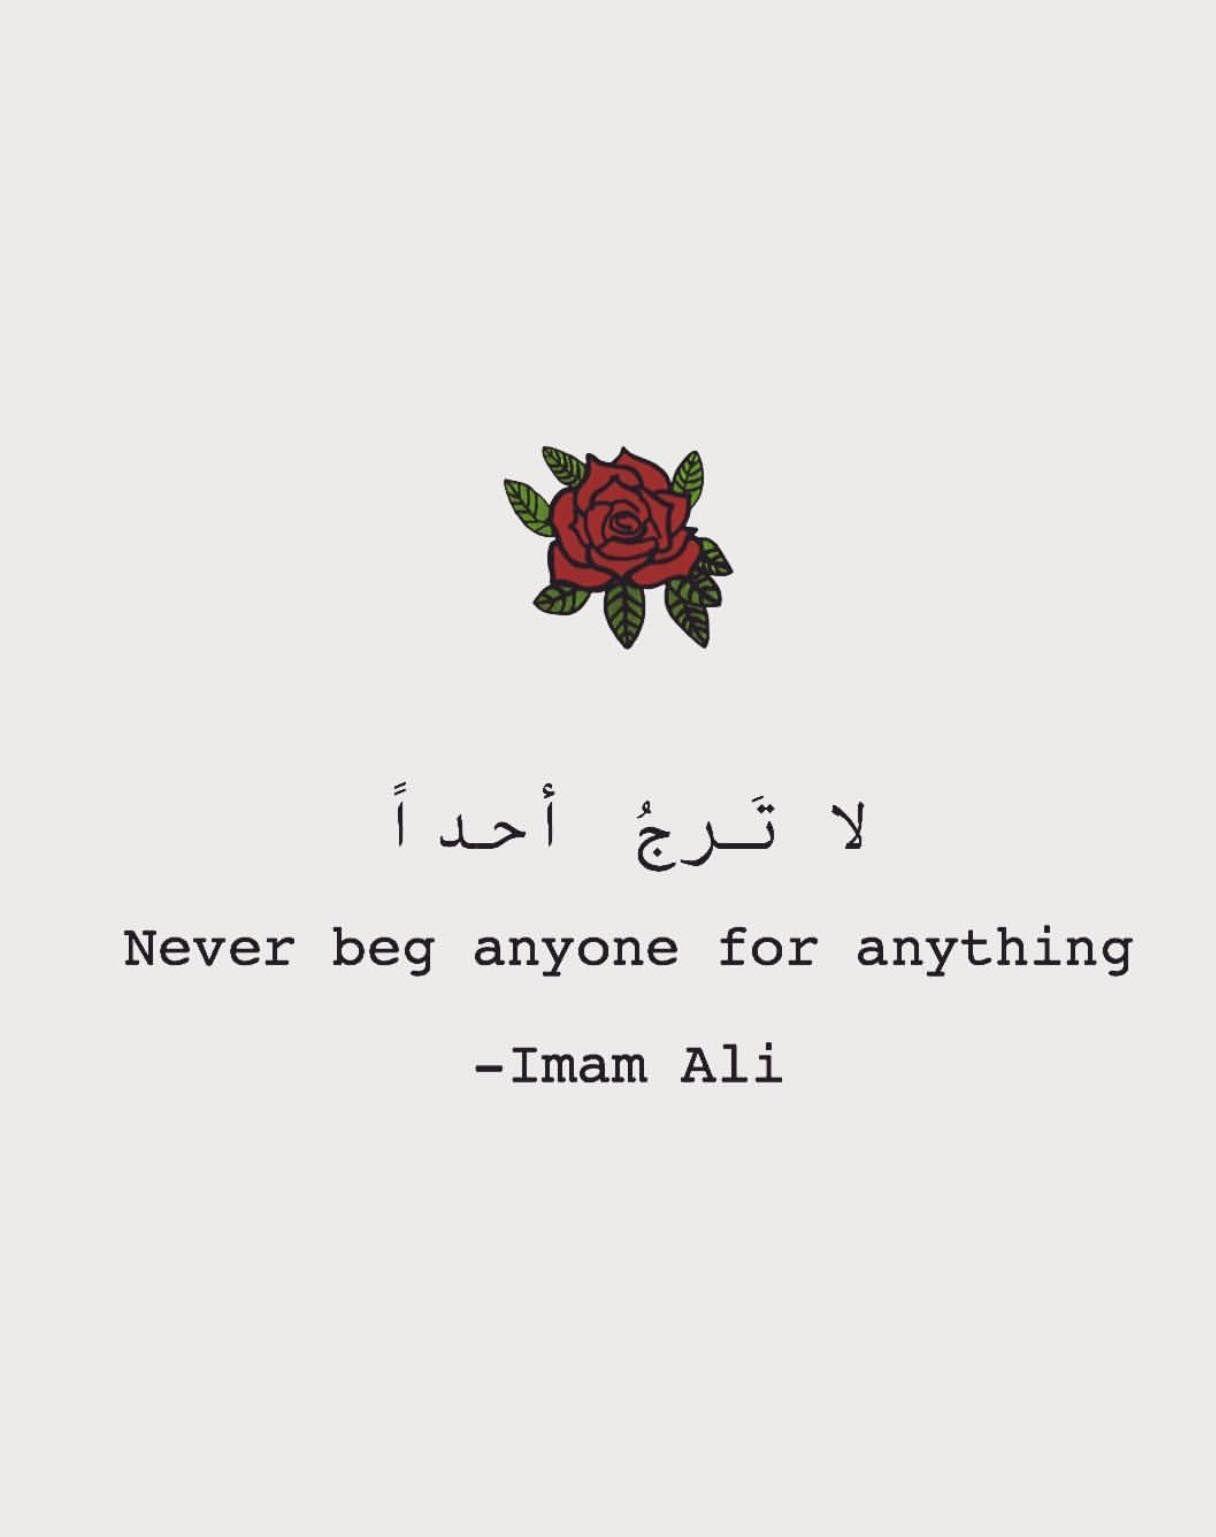 anything | Kata-kata indah, Kutipan agama, Kutipan lucu